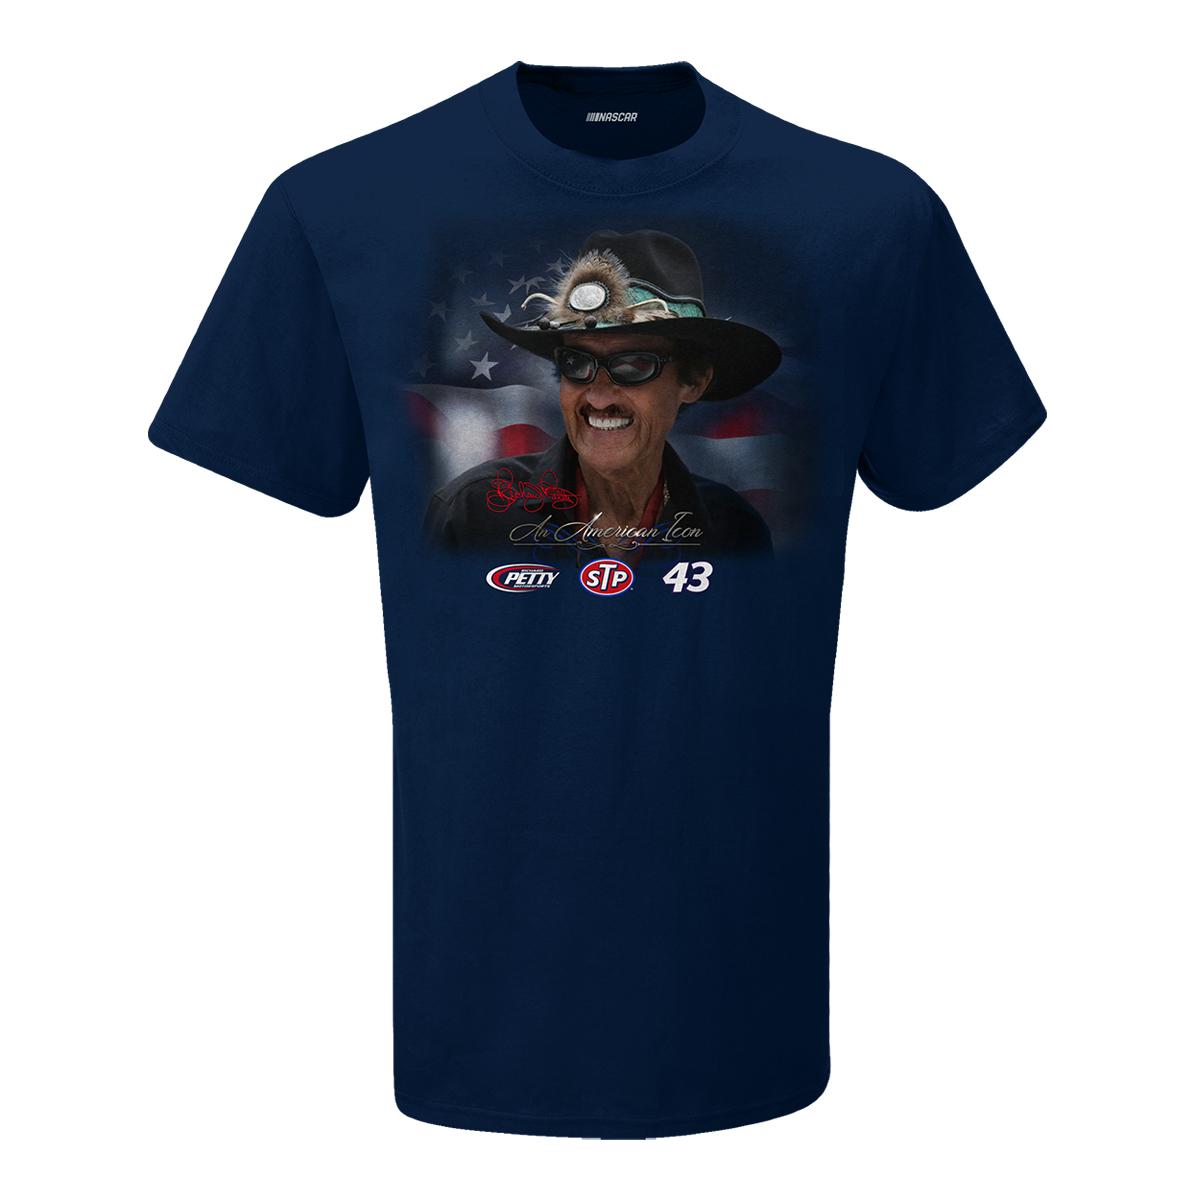 Richard Petty - An American Icon Blue Patriotic T-shirt